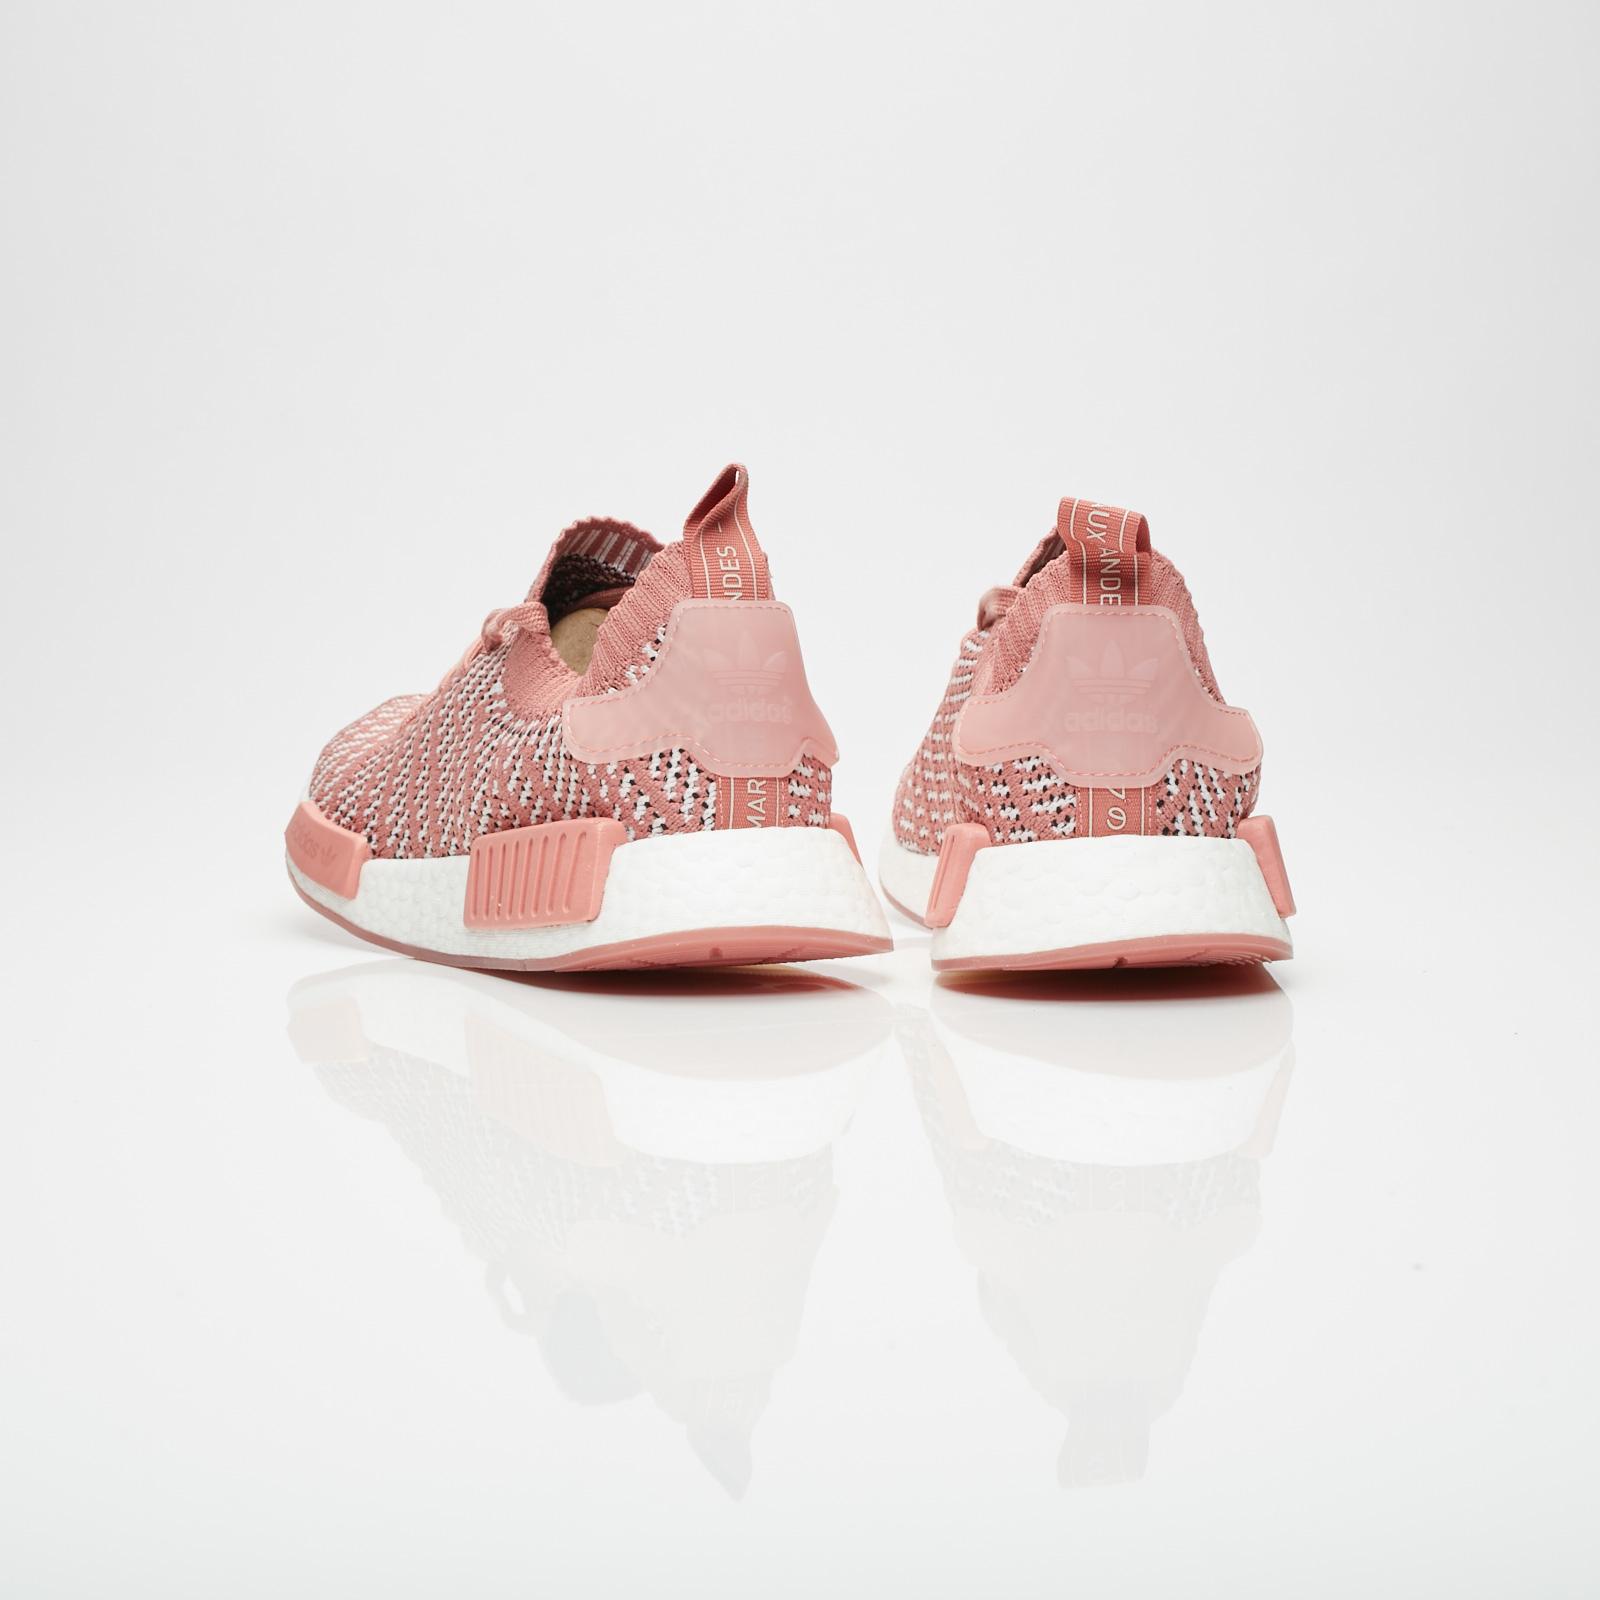 77489be350102 adidas NMD R1 STLT Primeknit Womens - Cq2028 - Sneakersnstuff ...